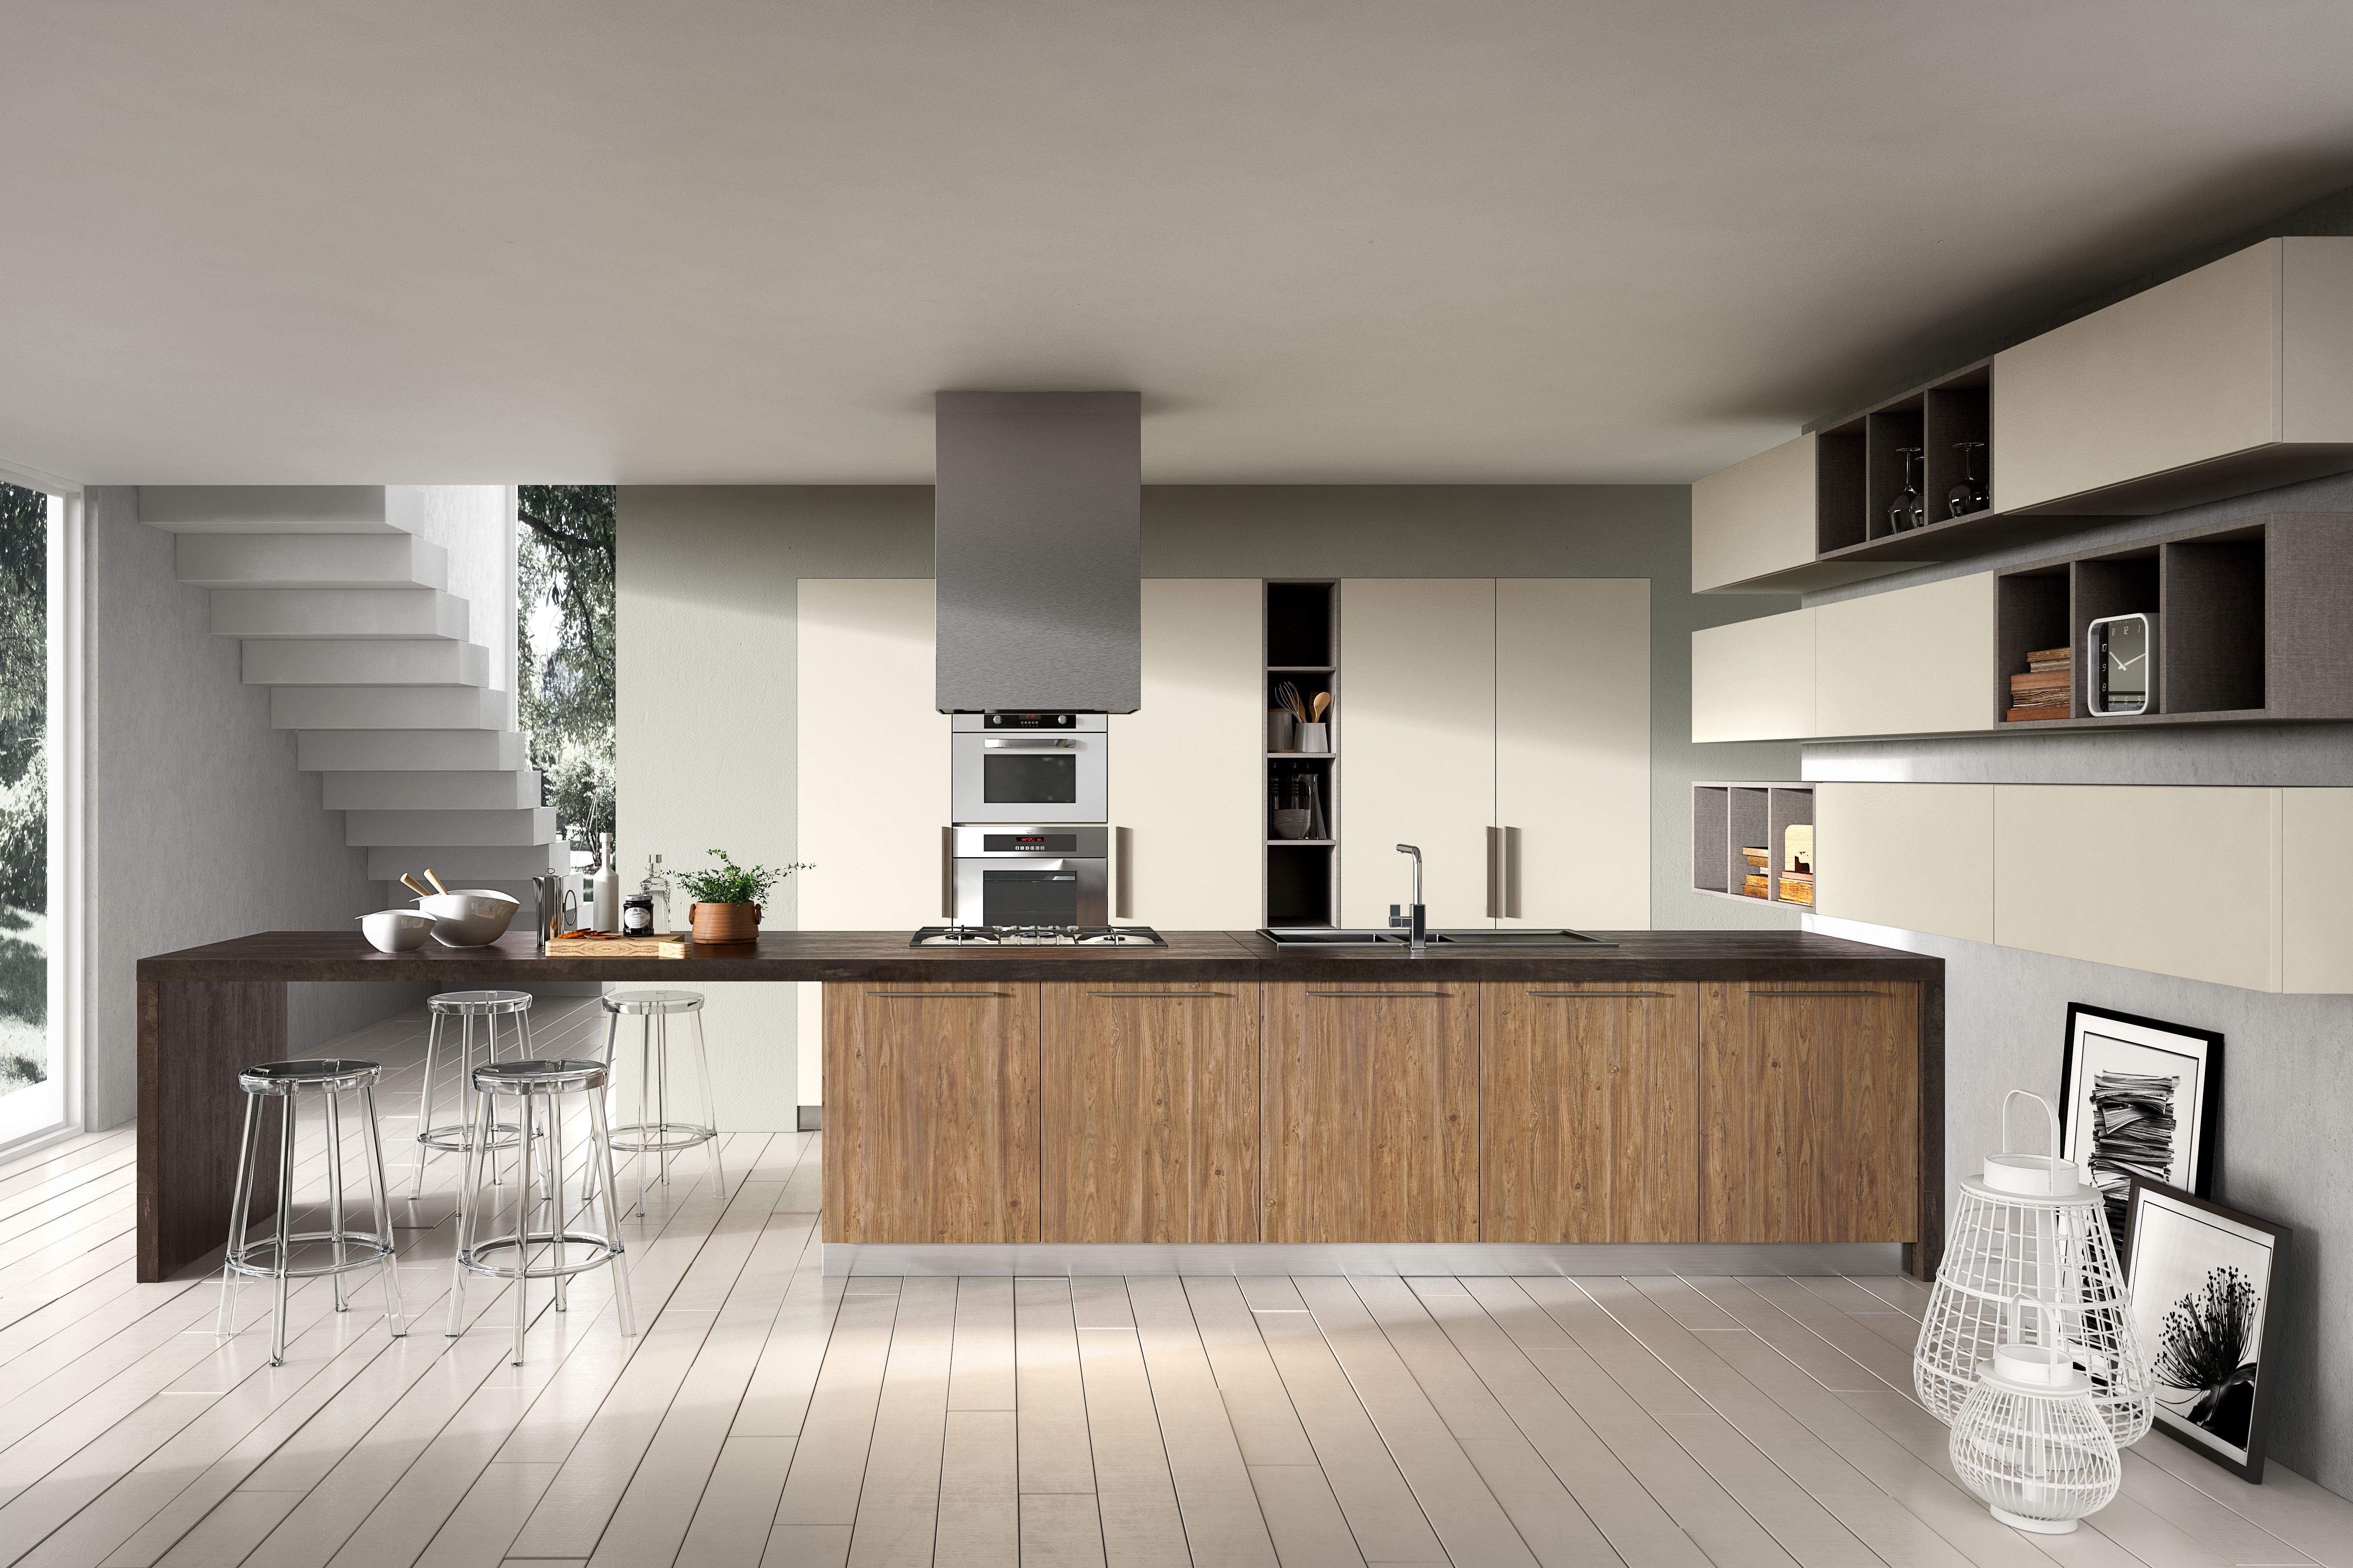 Armony Cucine Model Ypsilon Avec Images Decoration Cuisine Interieur Moderne De Cuisine Cuisine Elegante